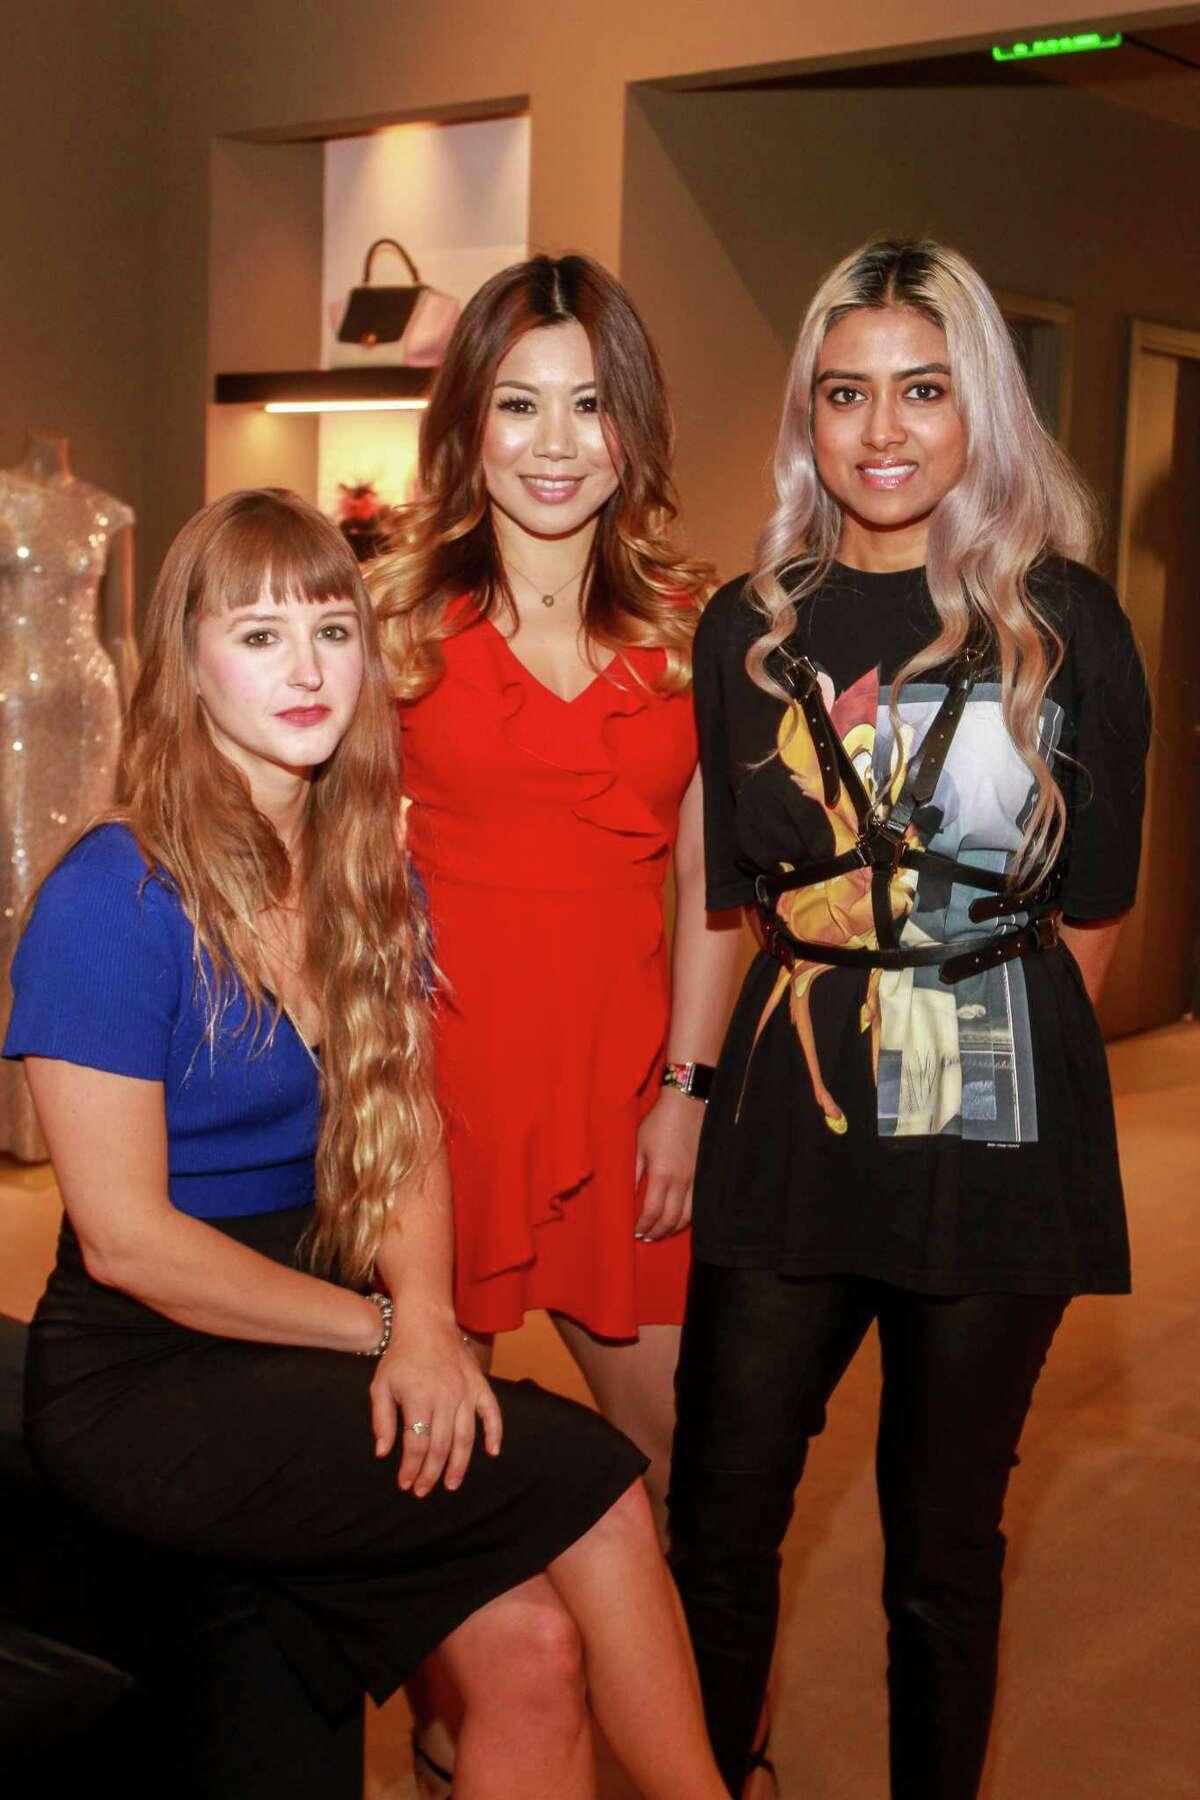 Eva Degenhardt, from left, Mandy Tseng and Ruchi Khan at the James Harden Foundation VIP Kickoff at The Webster.